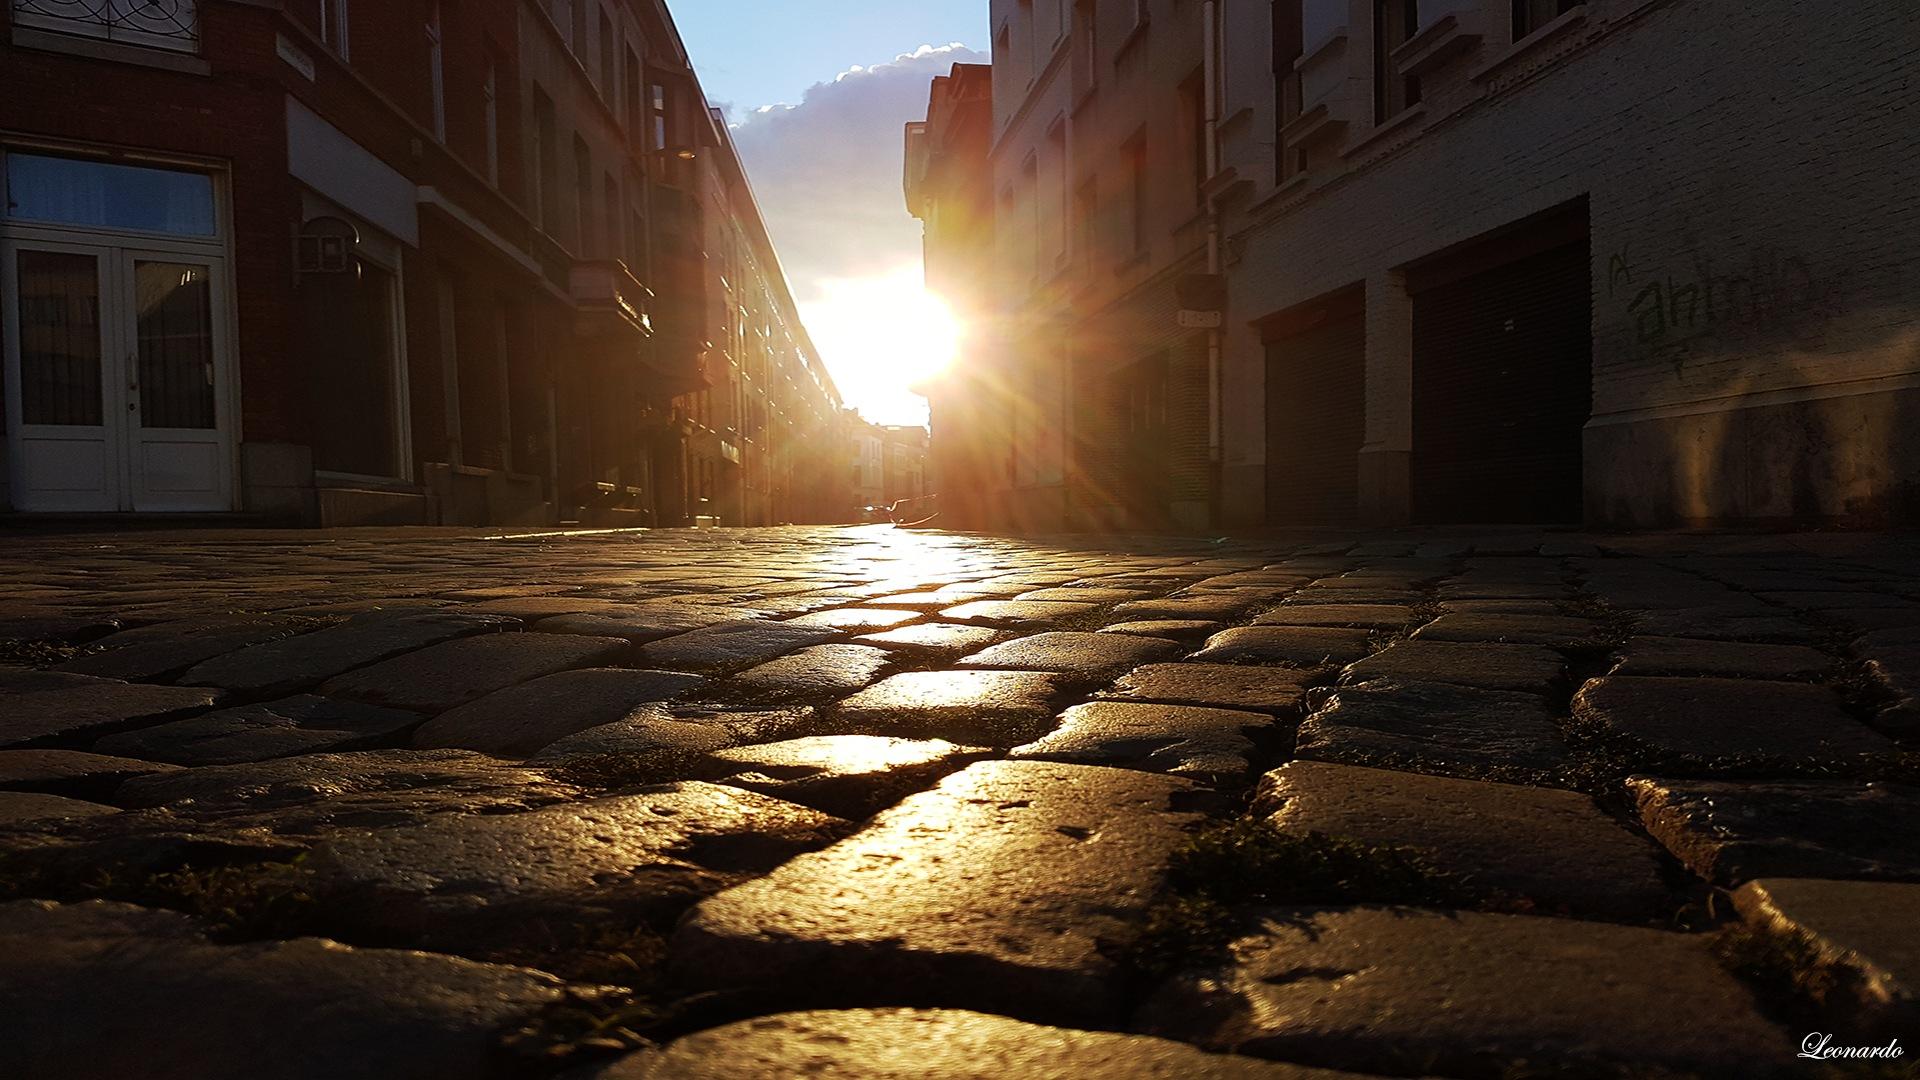 One morning in Antwerpen by gravinall